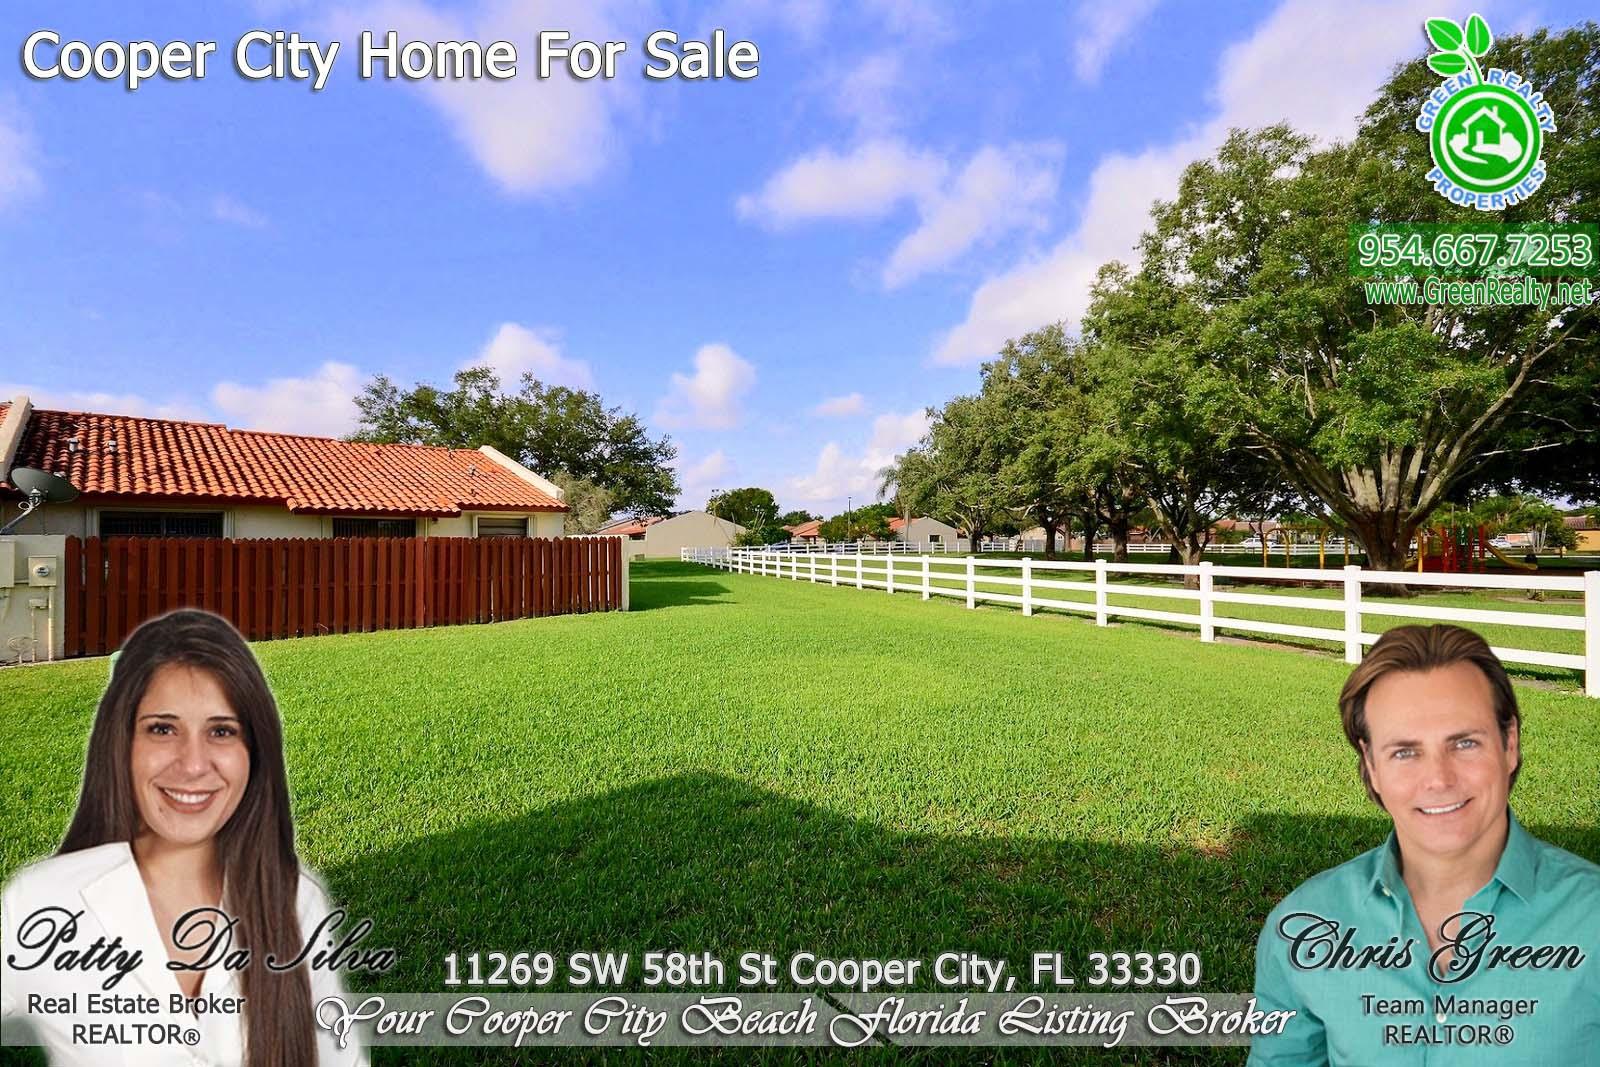 19 Cooper City Real Estate - Villas (4)